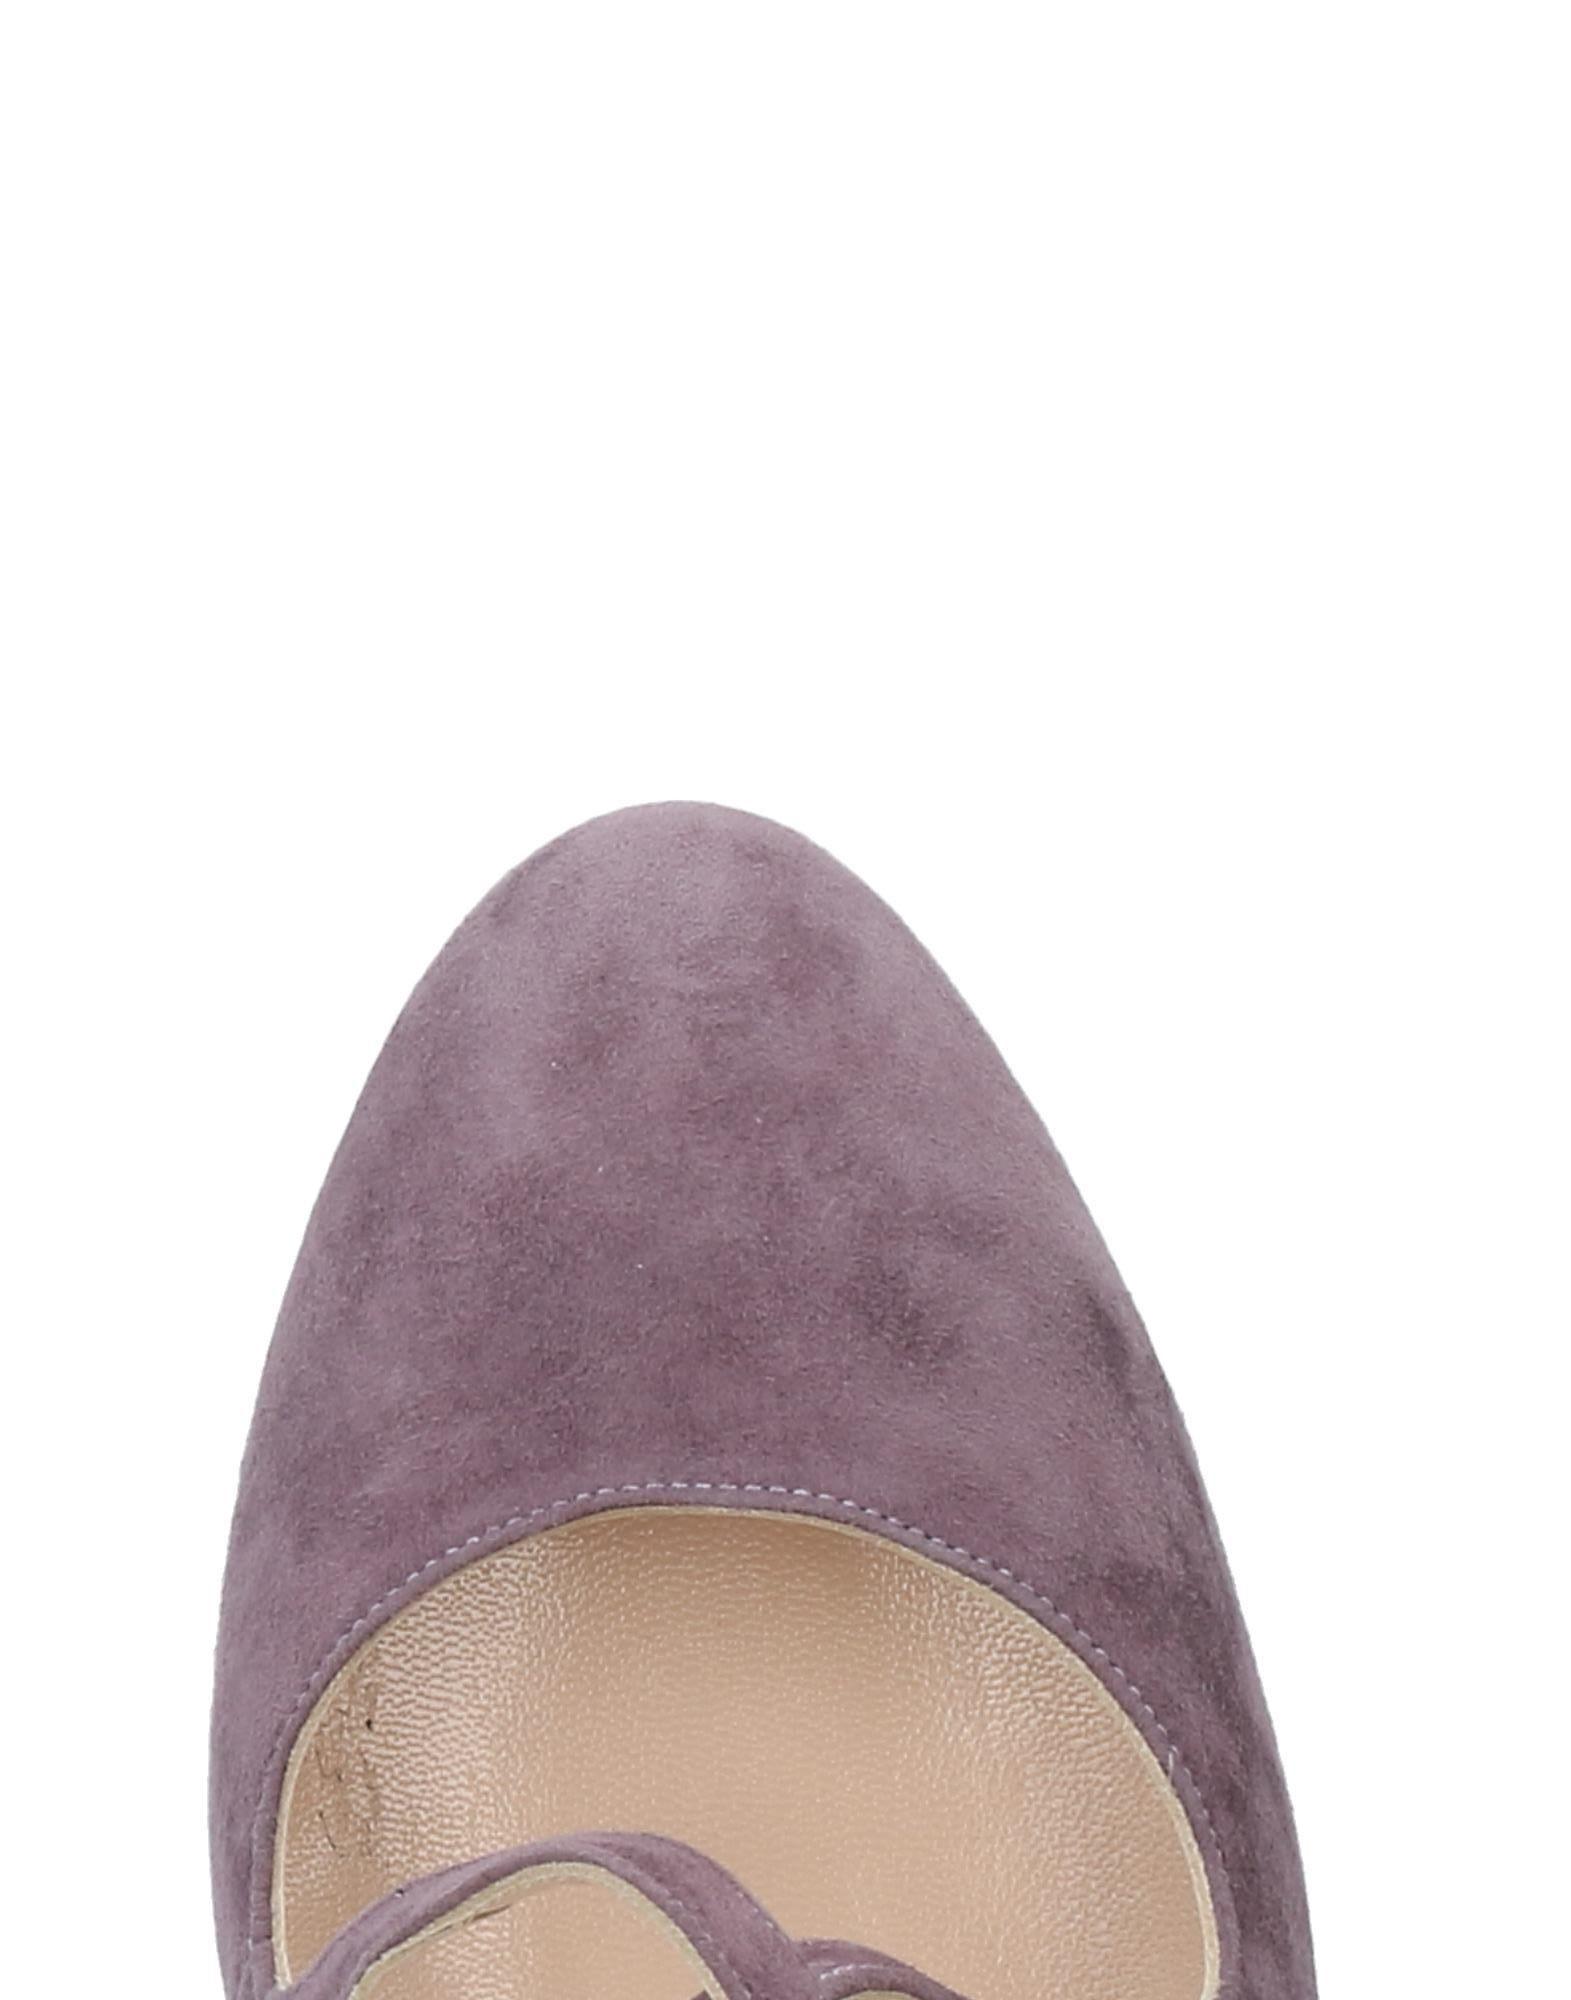 Festa Milano Pumps Damen  11457853QV Gute Qualität beliebte Schuhe